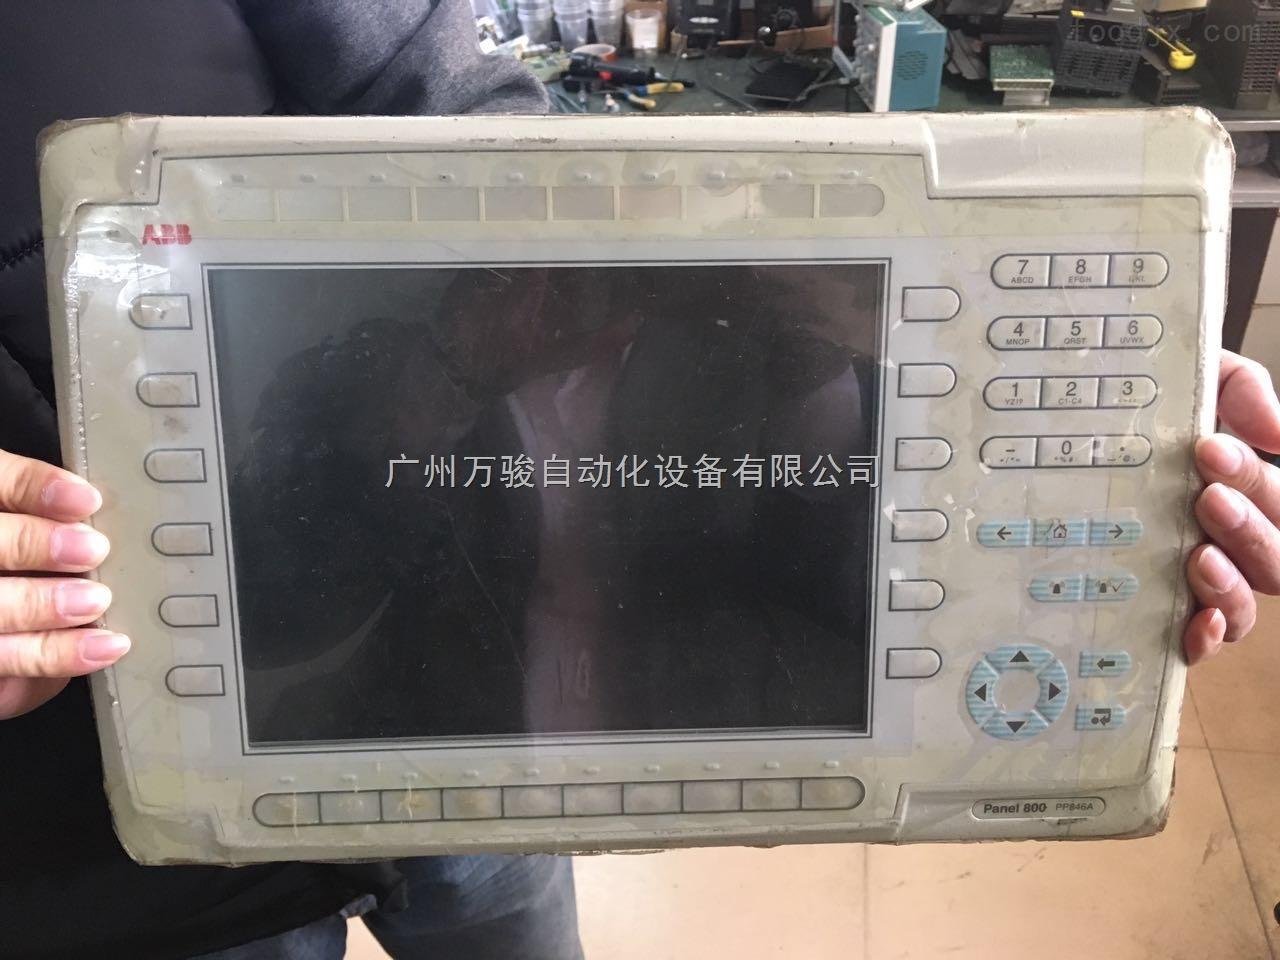 PP846A-广州ABB操作面板维修厂家